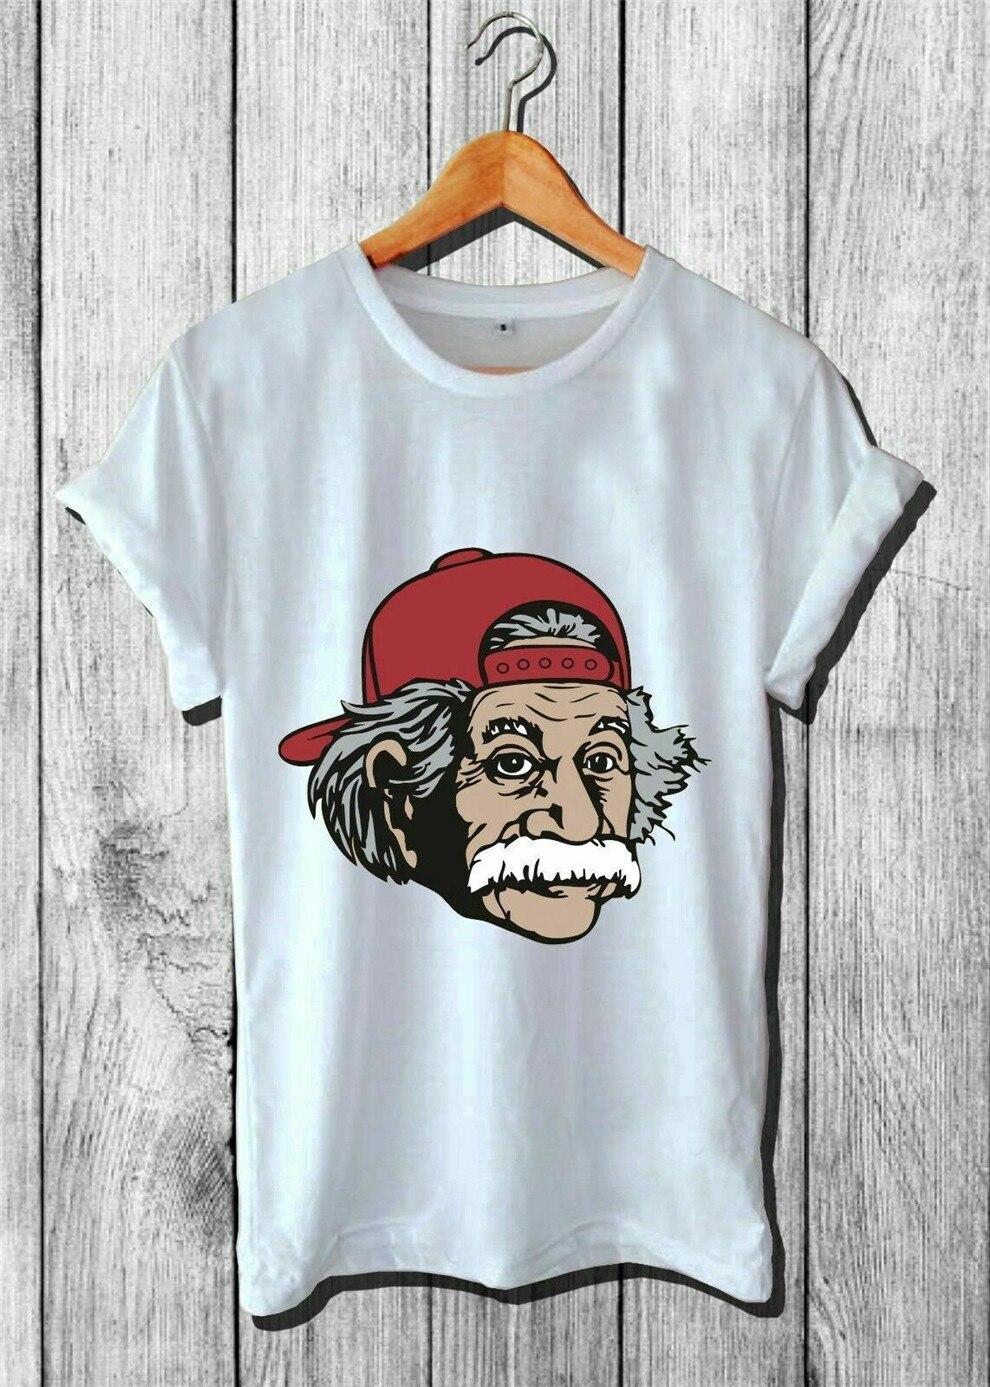 Top caliente Einsten Hipster estilo Streetwear hombres Casual Wear Usa Size camiseta En1 camiseta de figura completa